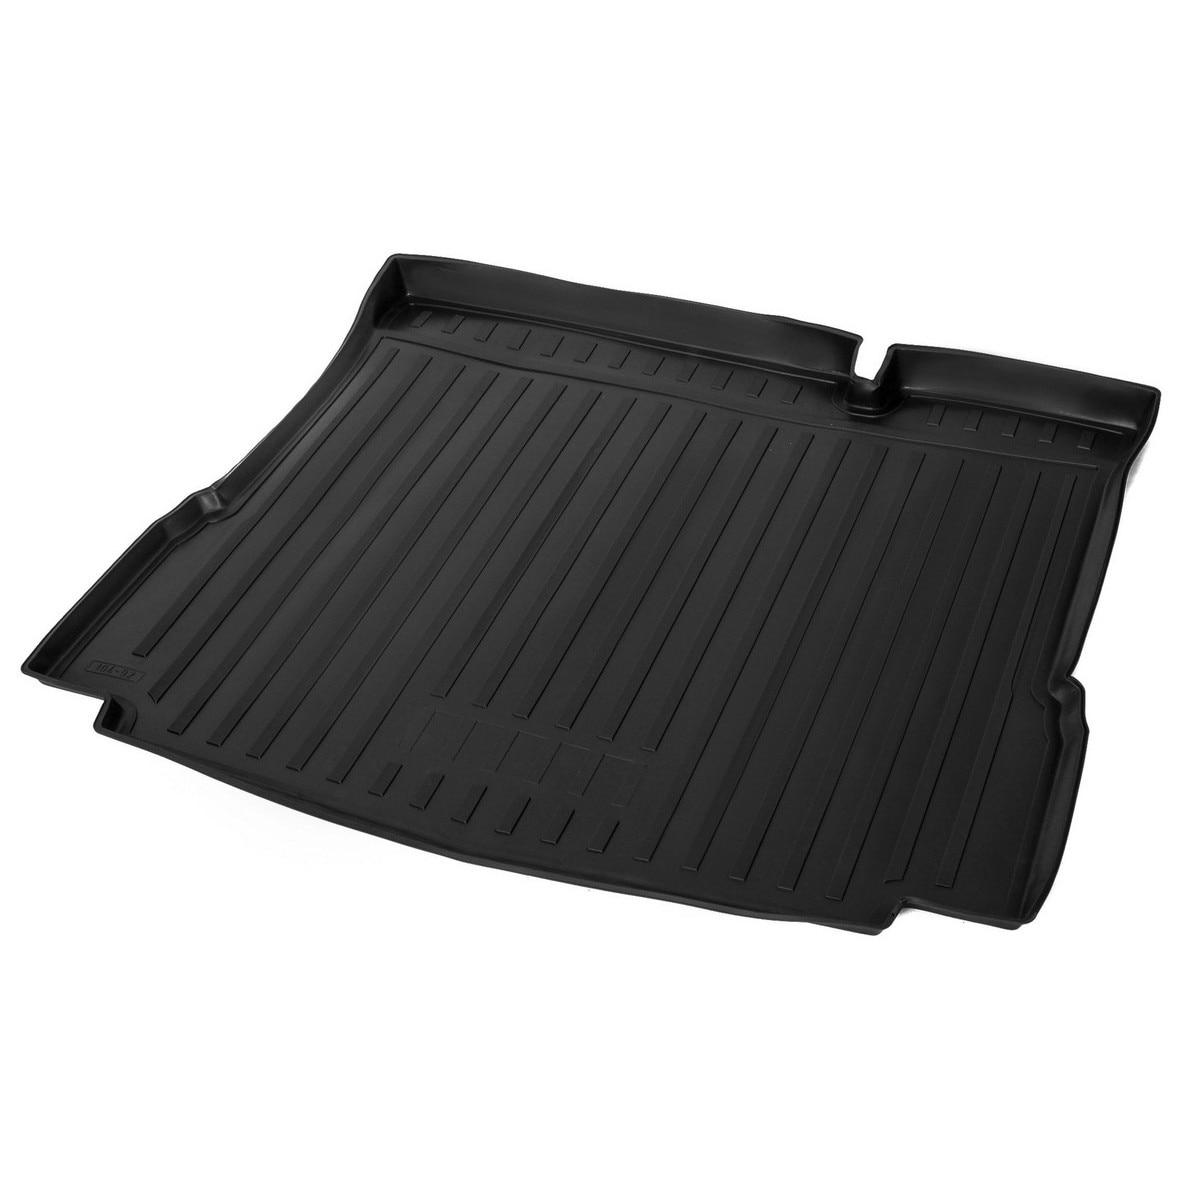 Boot Mat Rival 16007002 custom fit car trunk mat for honda brv vezel hybrid hybrid spirior boot liner rear trunk cargo mat floor tray carpet mud cover